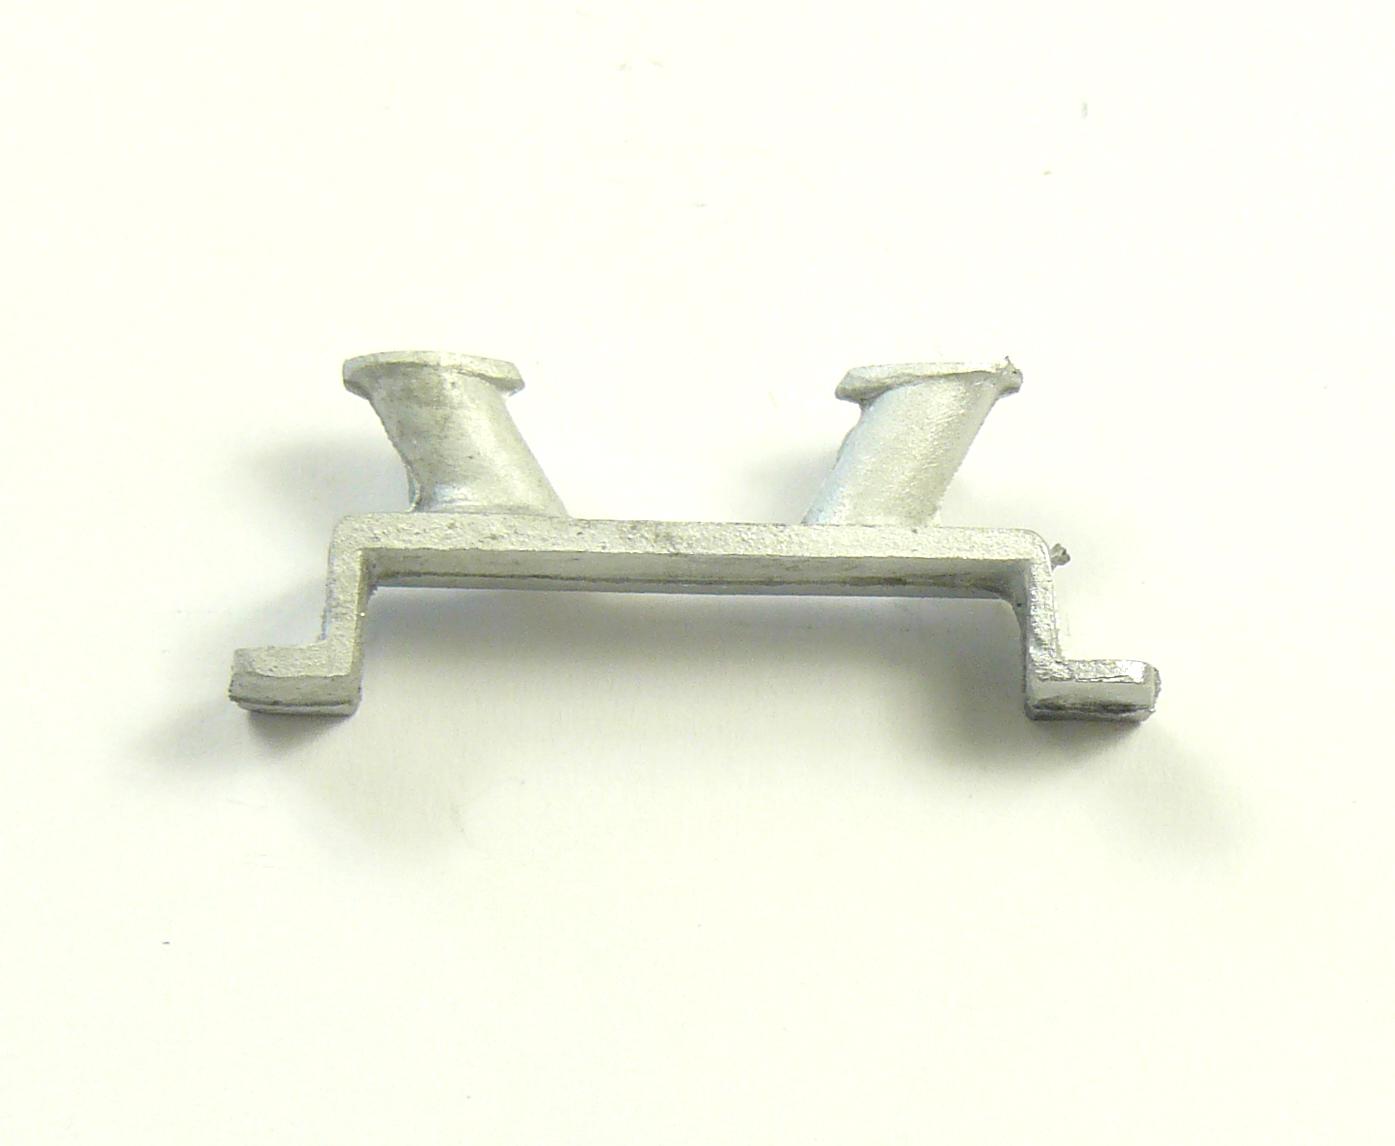 2 x White Metal Stepped Bollard 37mm